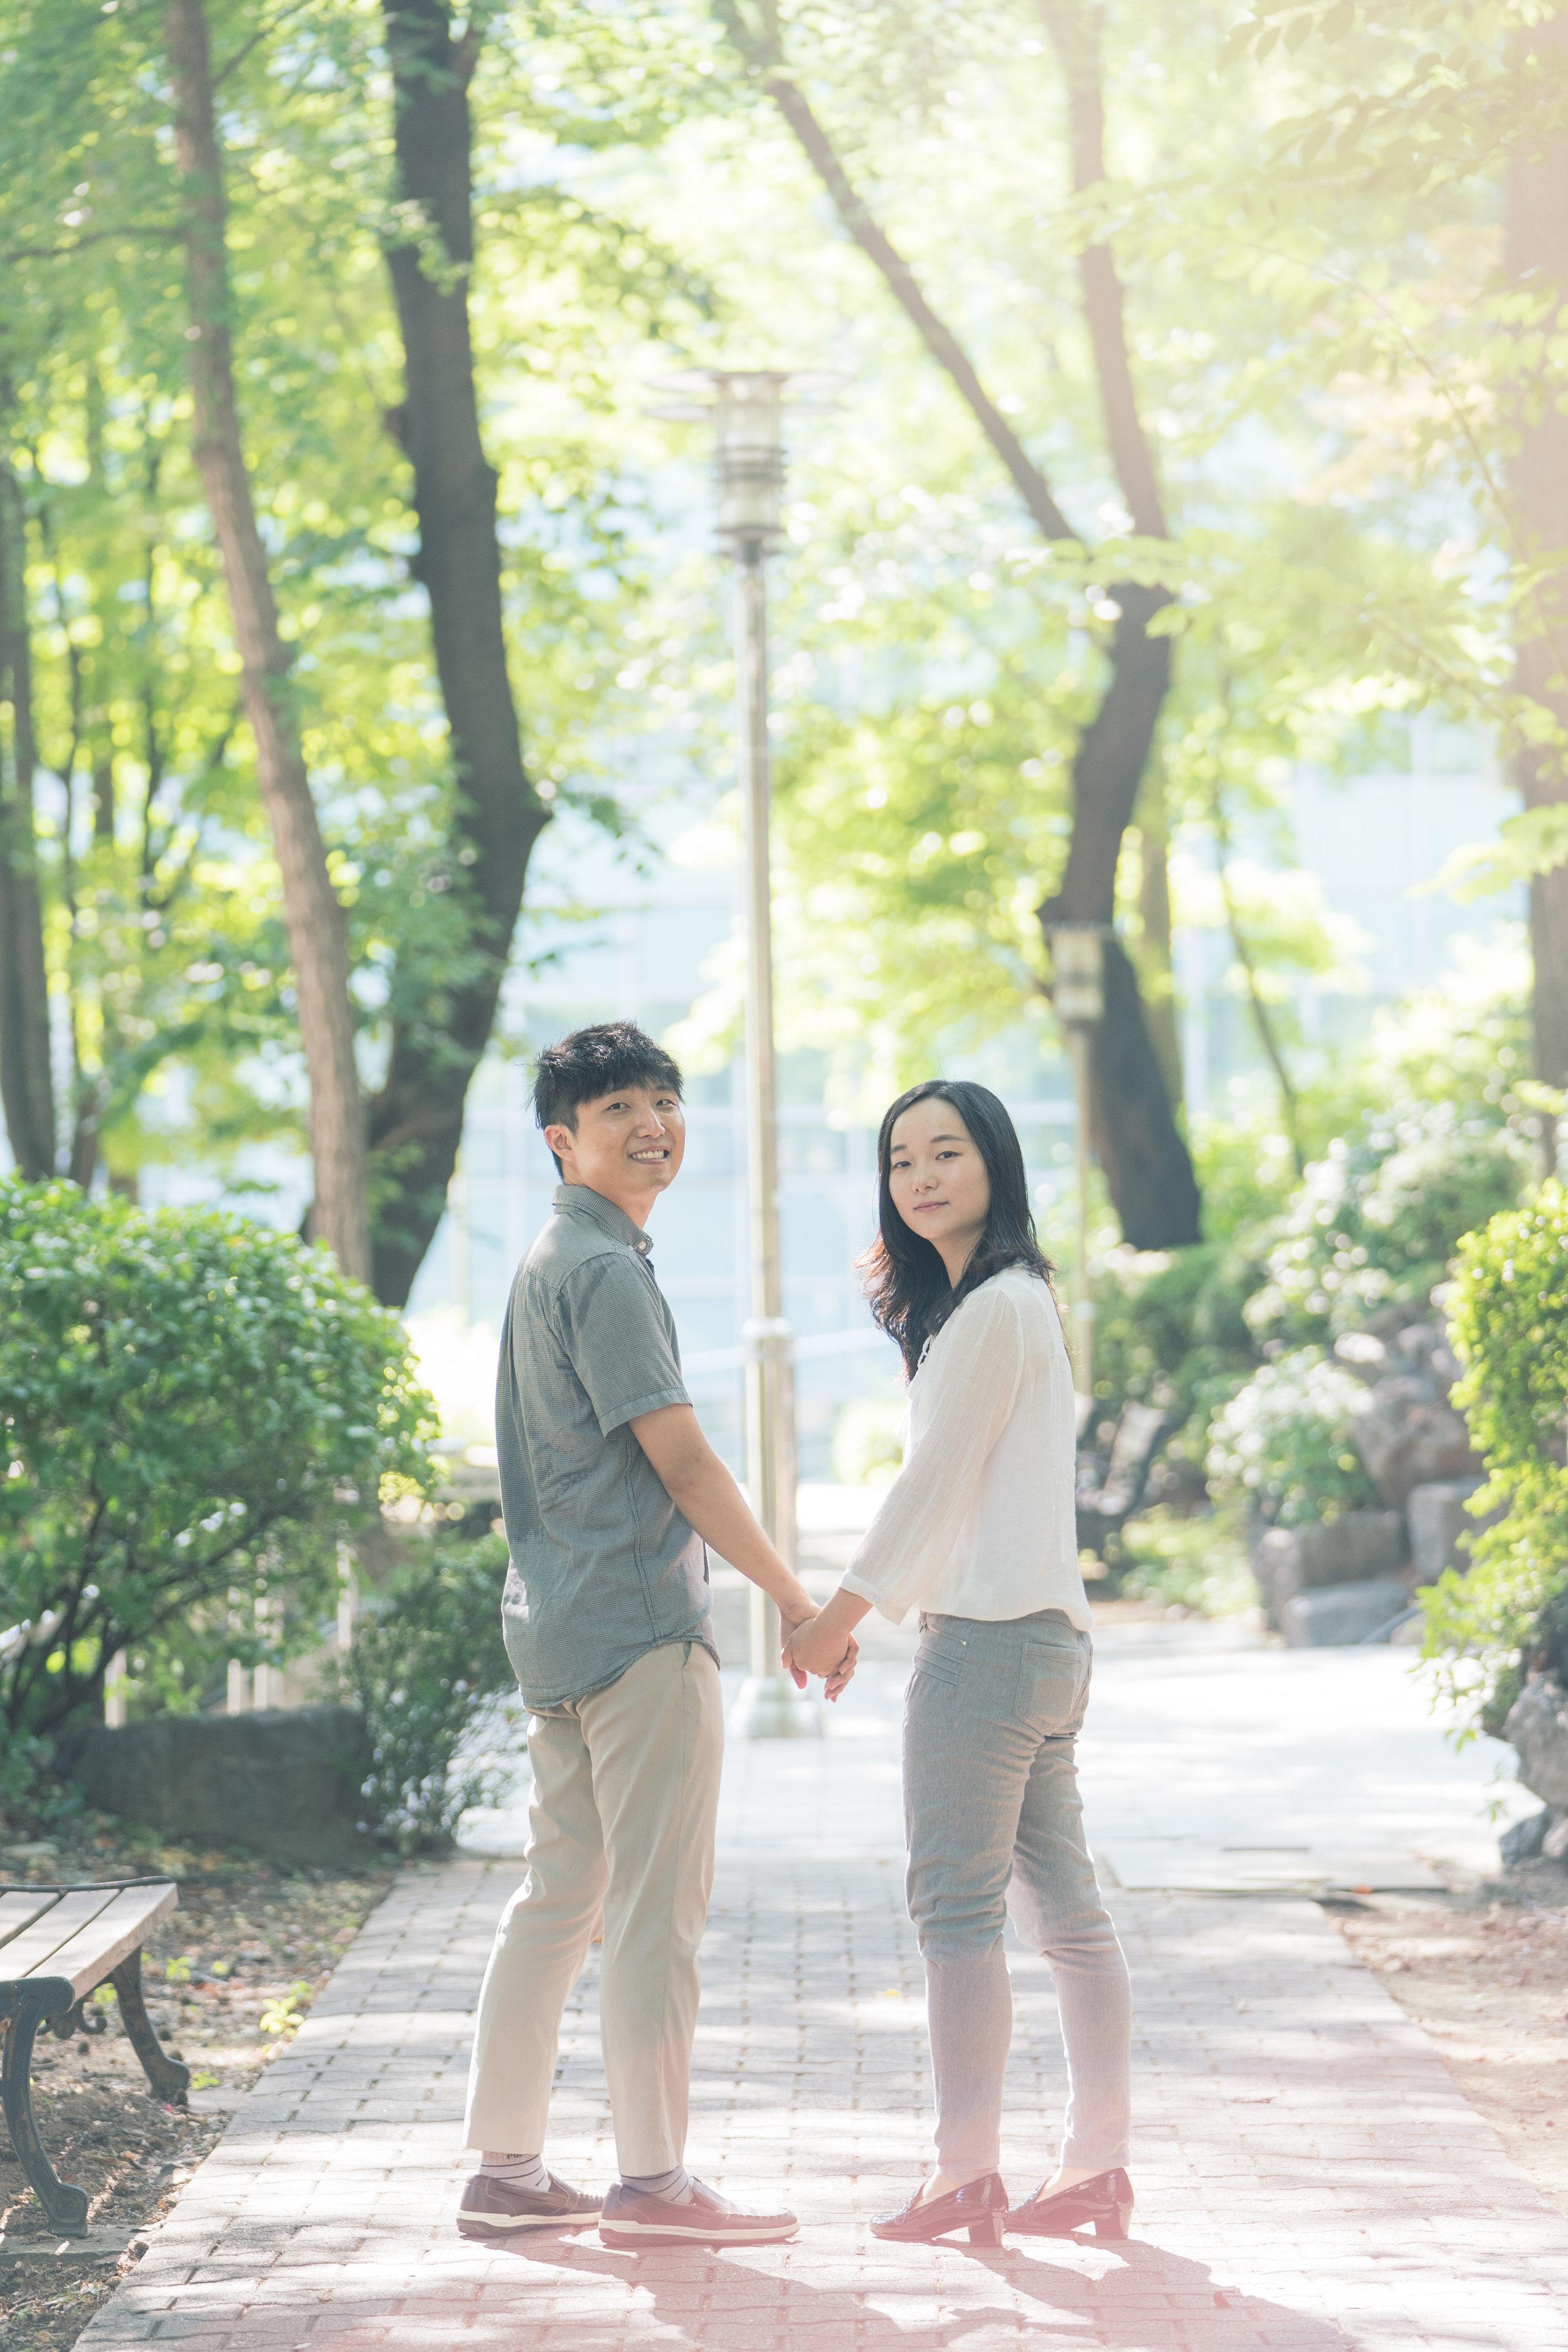 Sprazzi_Professional_Photography_Photographer_Seoul_Korea_Sion_Original_51.jpg